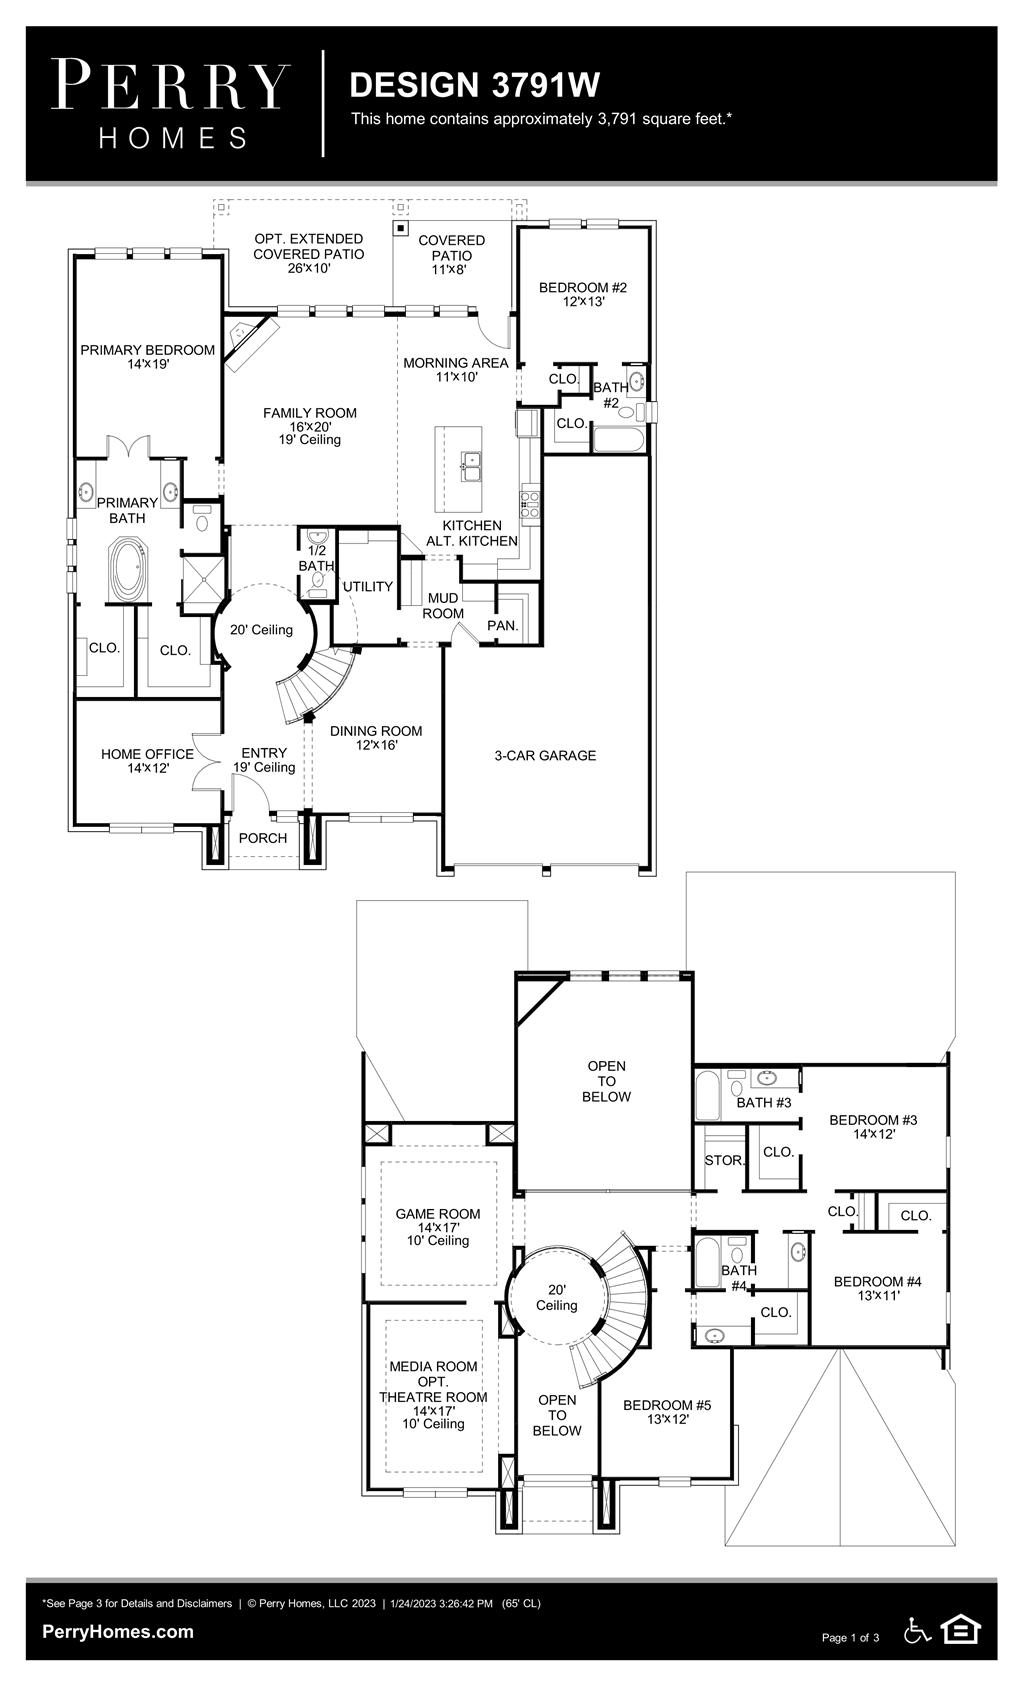 Floor Plan for 3791W